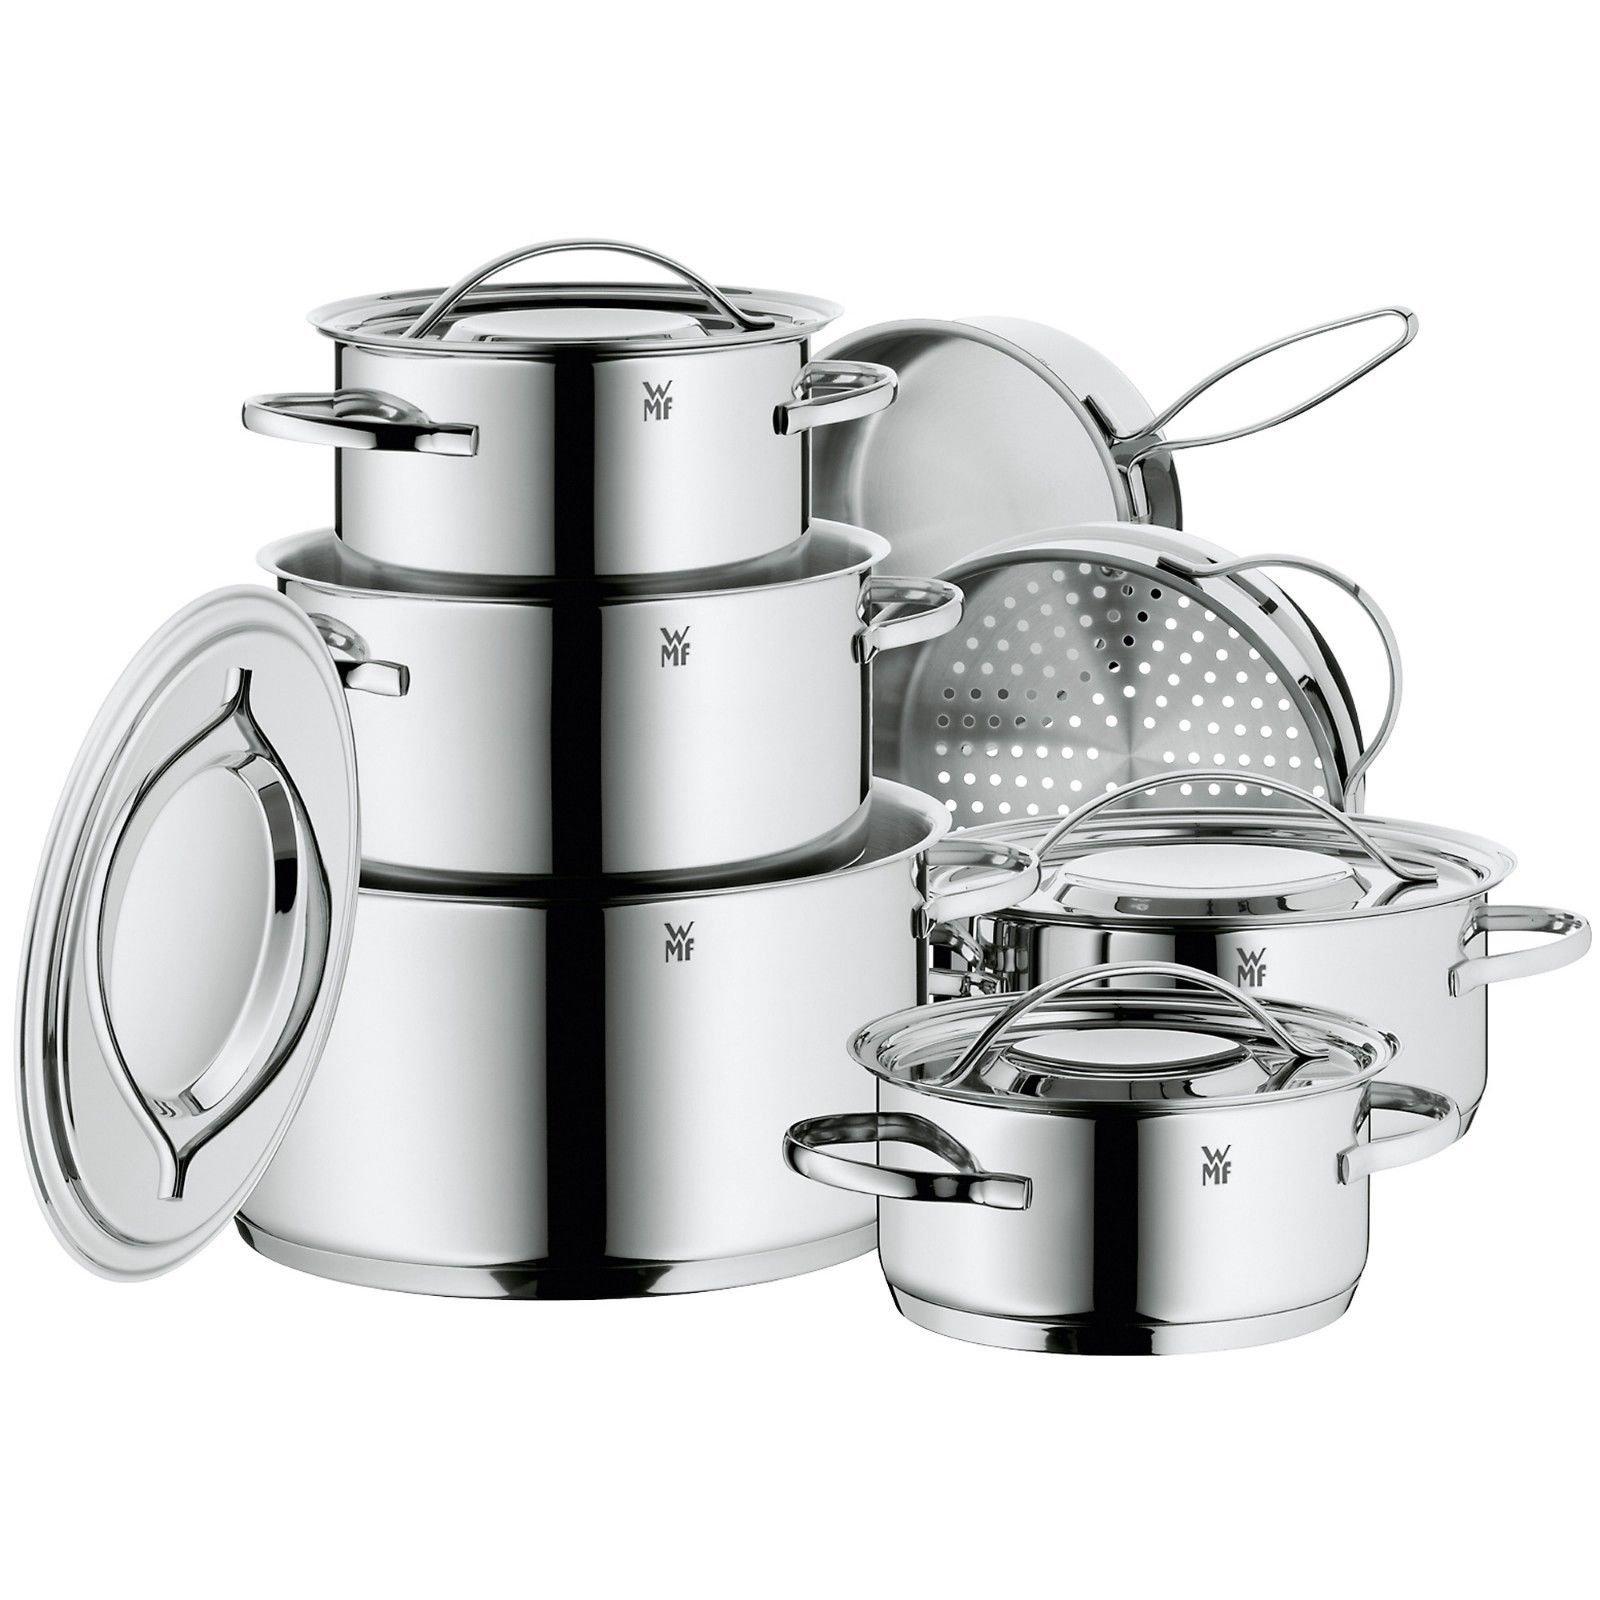 WMF Gala II 12-Piece Cookware Set